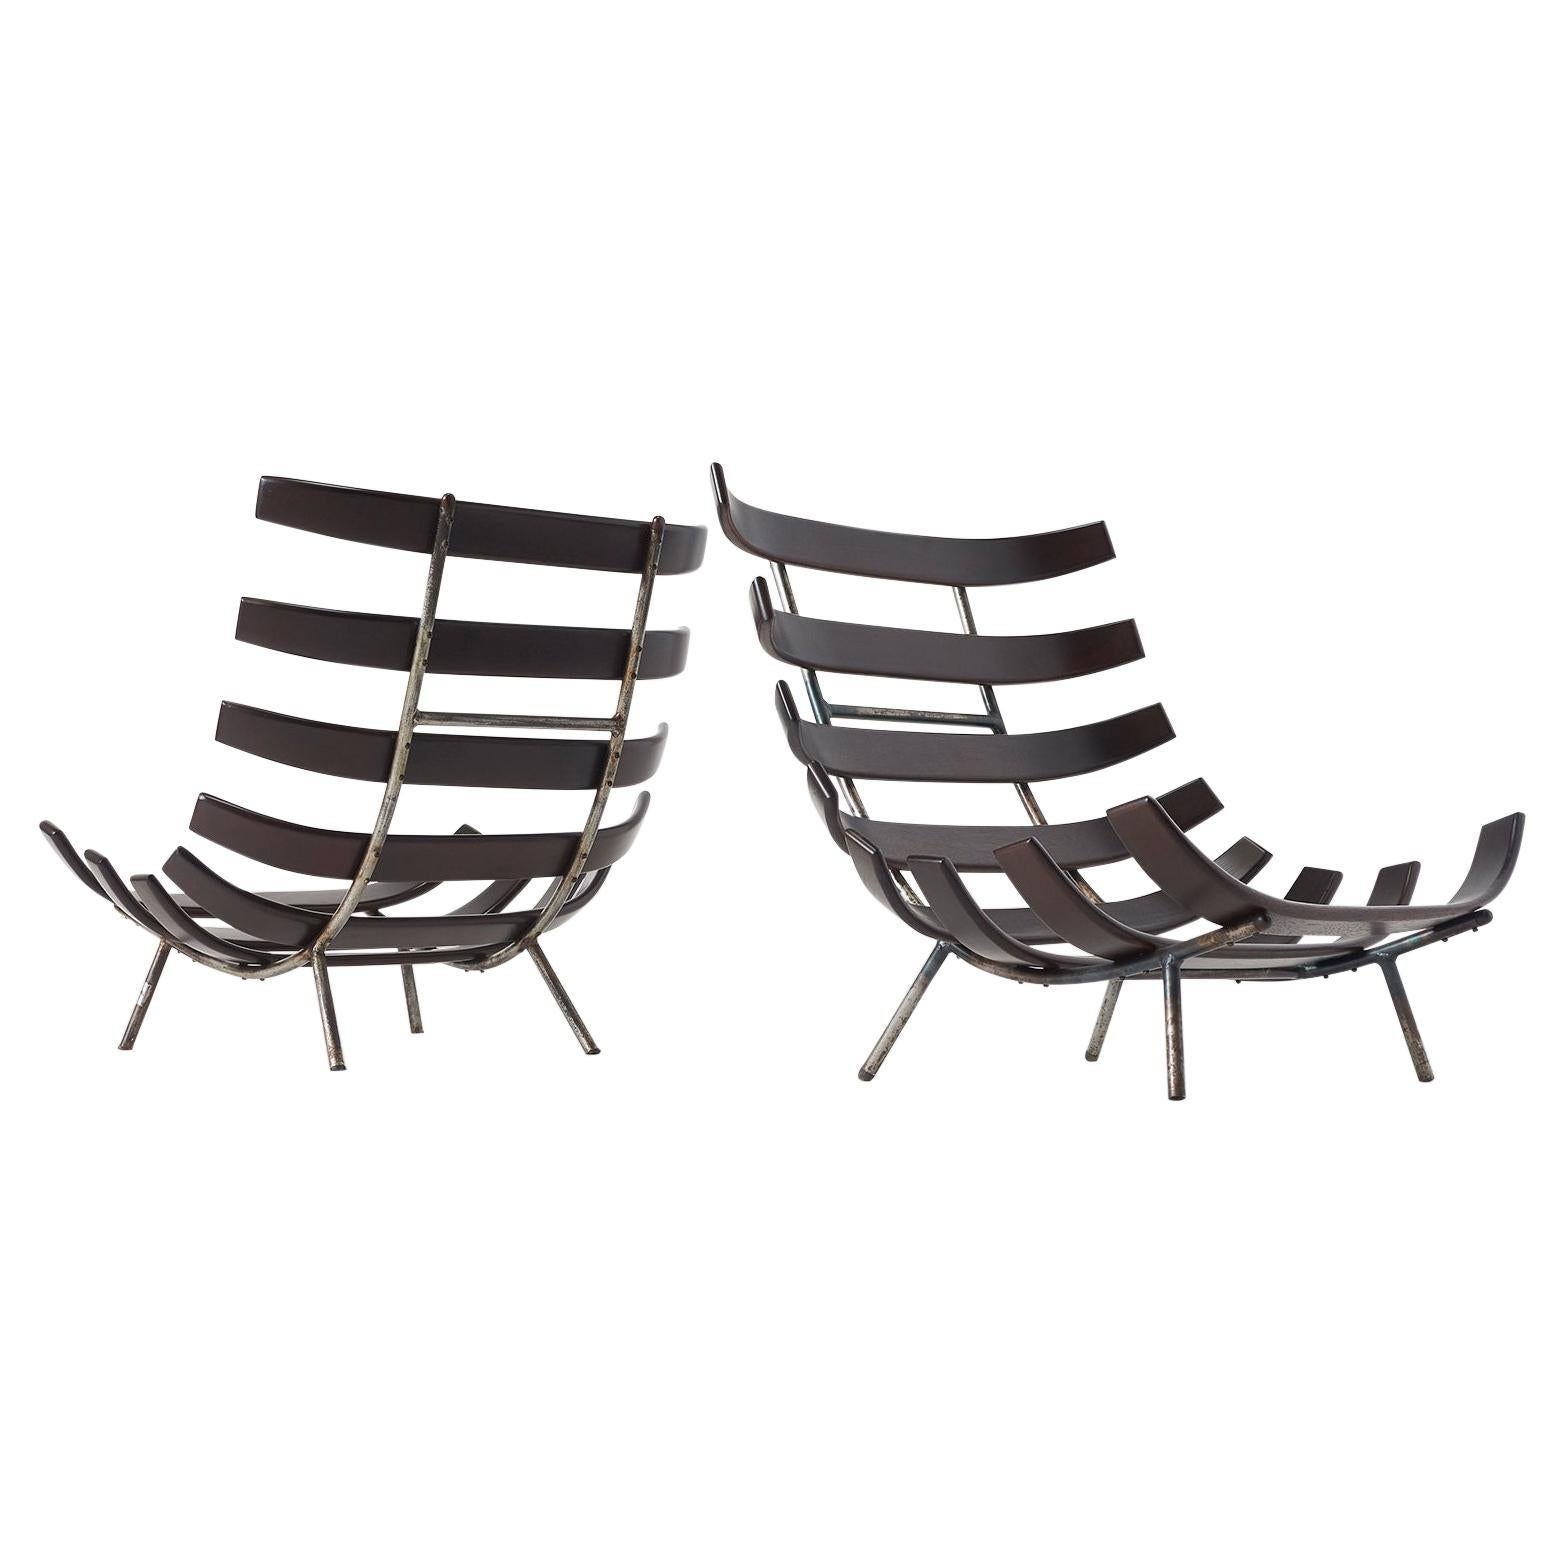 Martin Eisler and Carlo Hauner Costela Chair